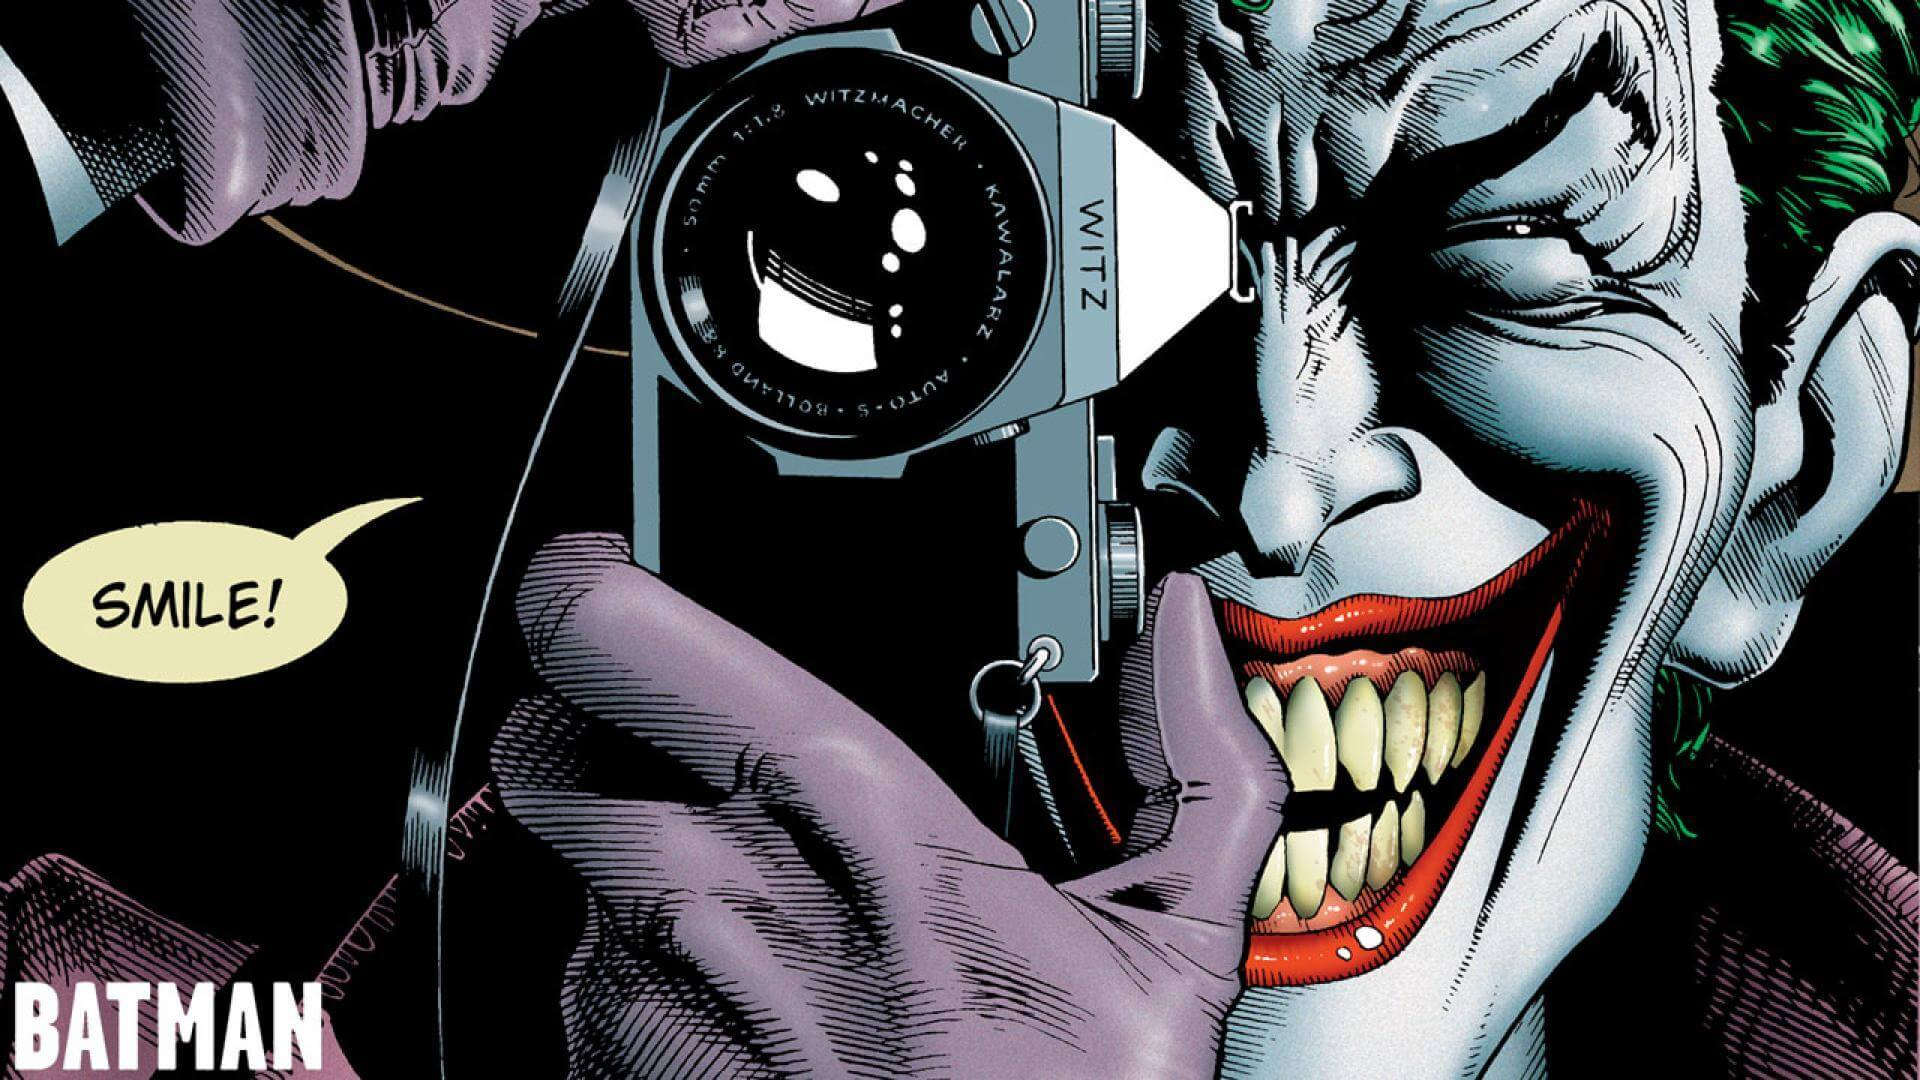 The Killing Joke Premiering at SDCC?